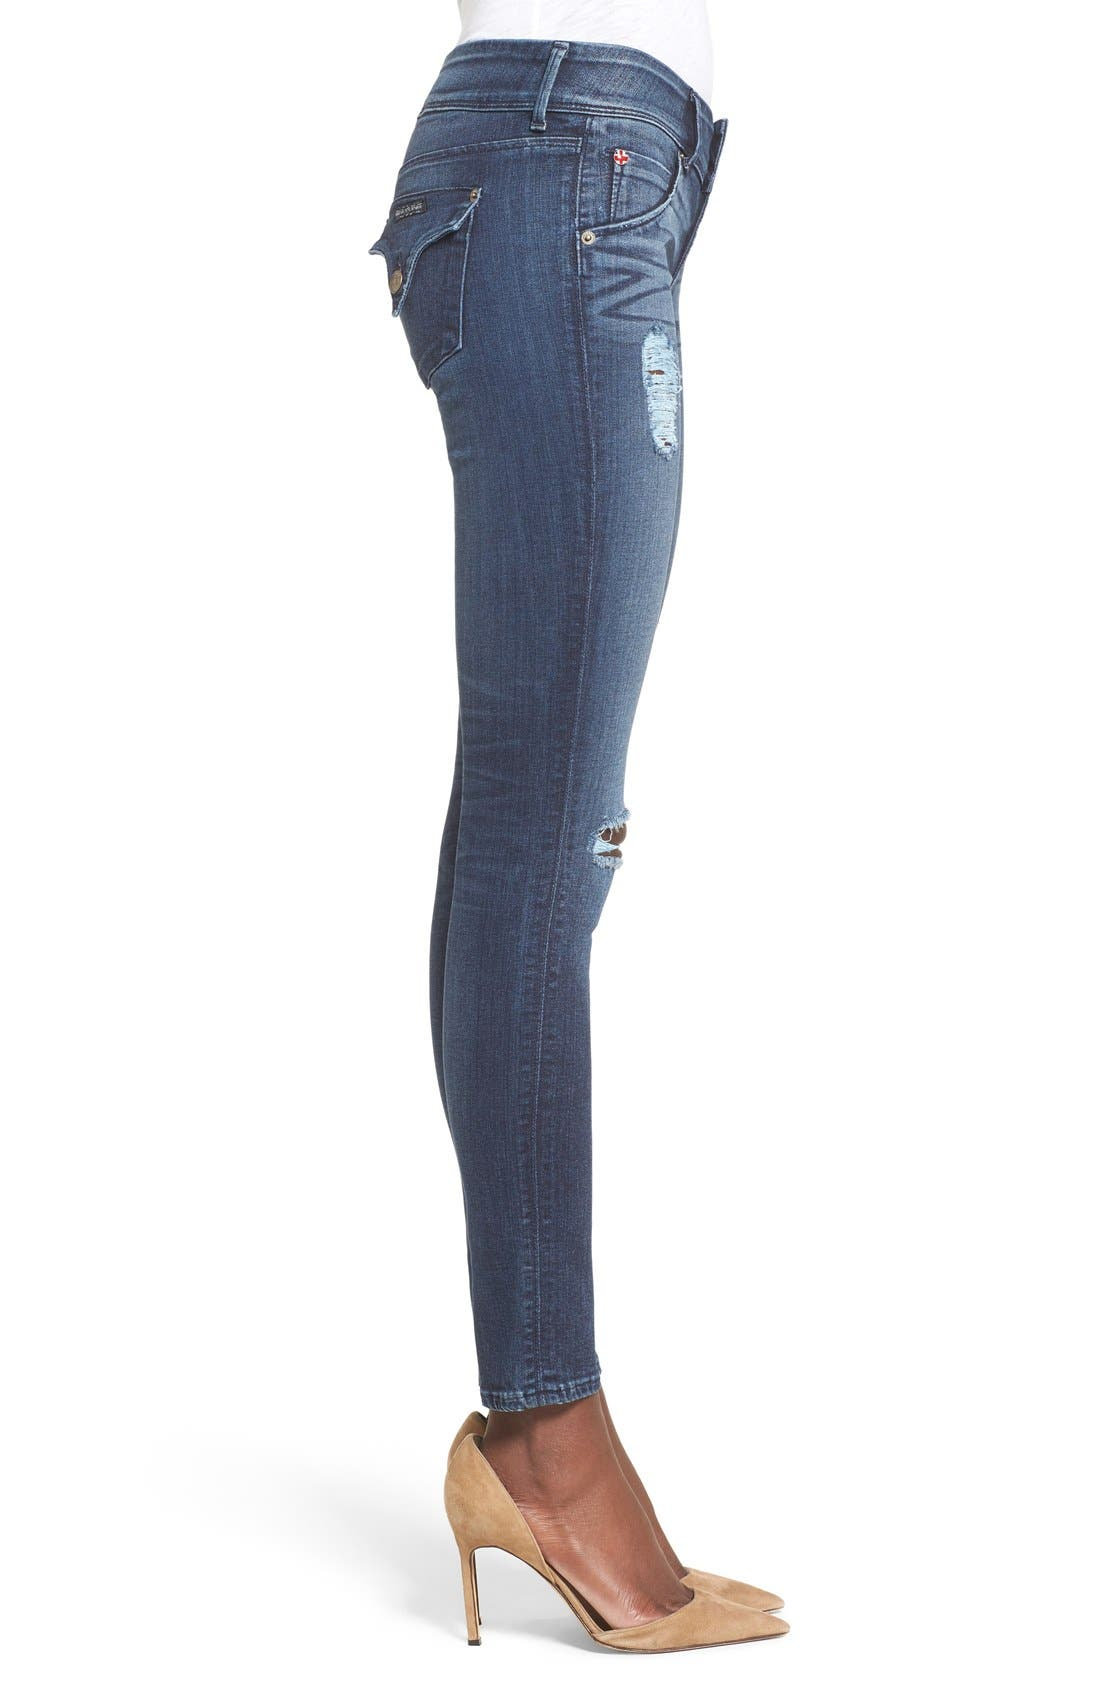 Alternate Image 3  - Hudson Jeans 'Collin' Skinny Jeans (Anchor Light)